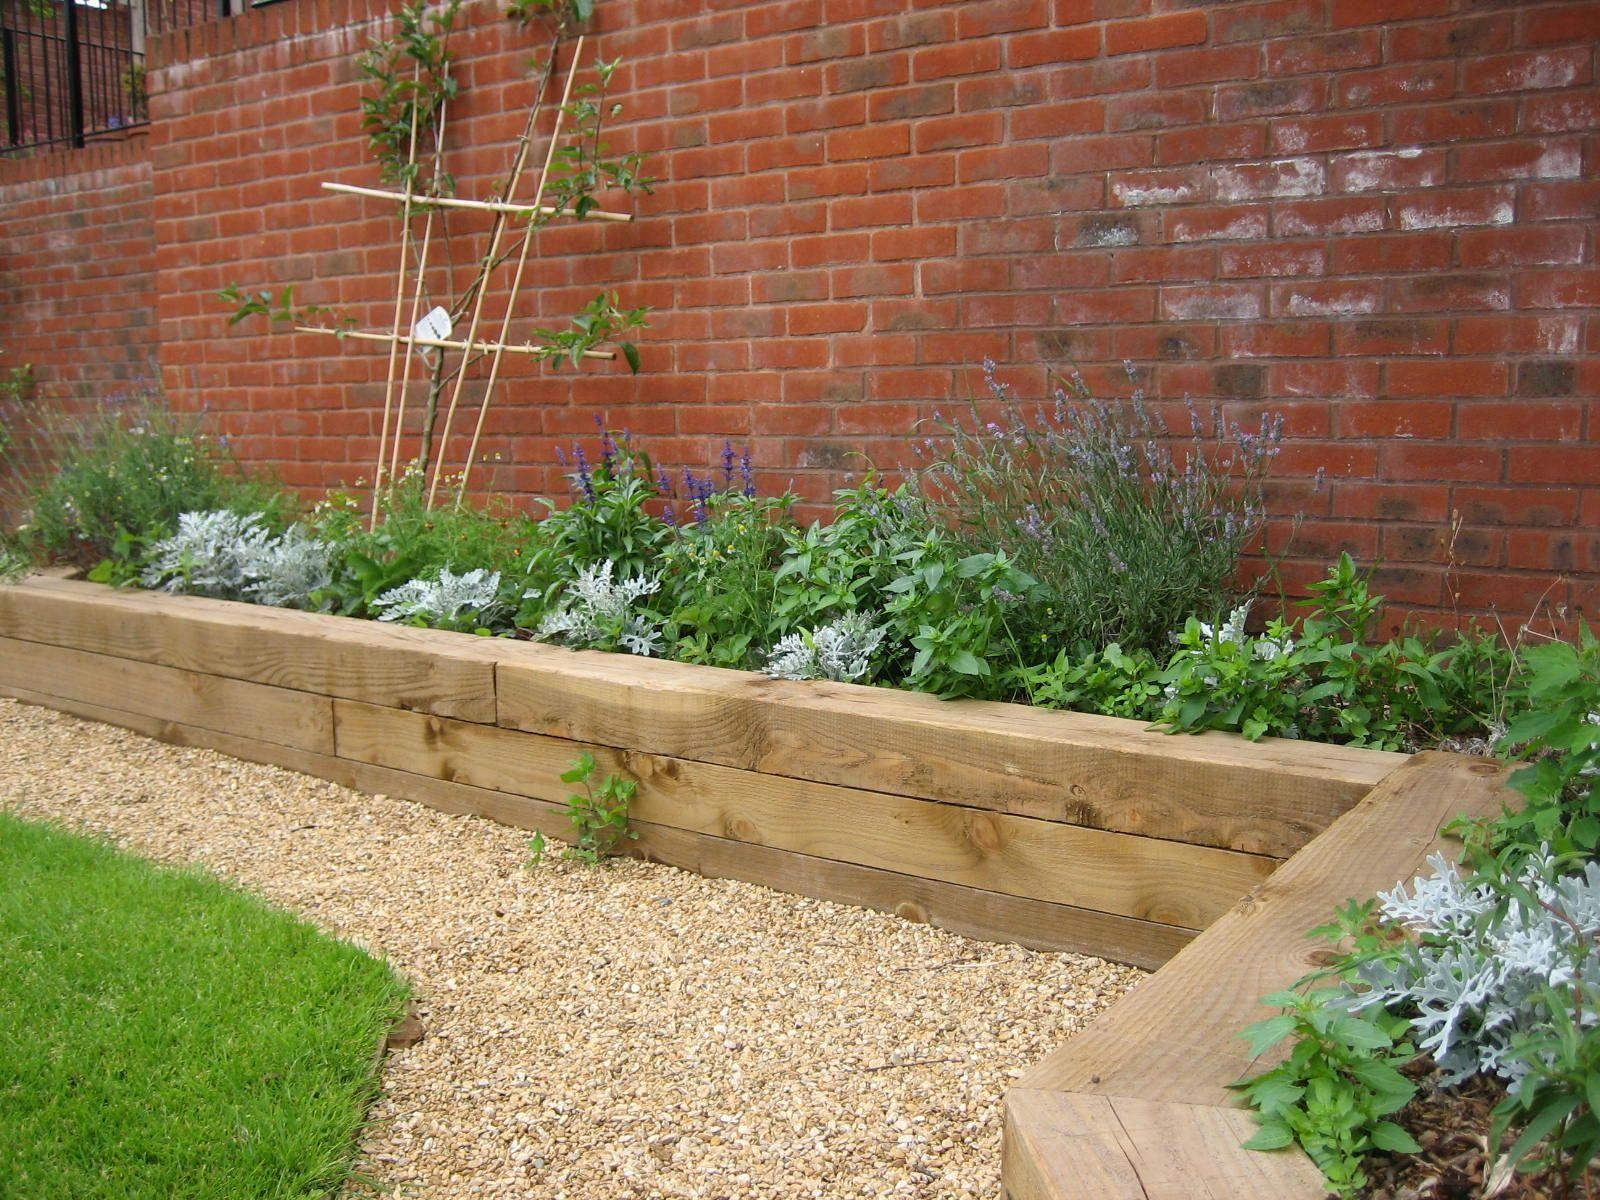 Raised Garden Along A Brick Wall Adds Color Muur Metselen Tuin Tuin Ideeen Tuin Makeover